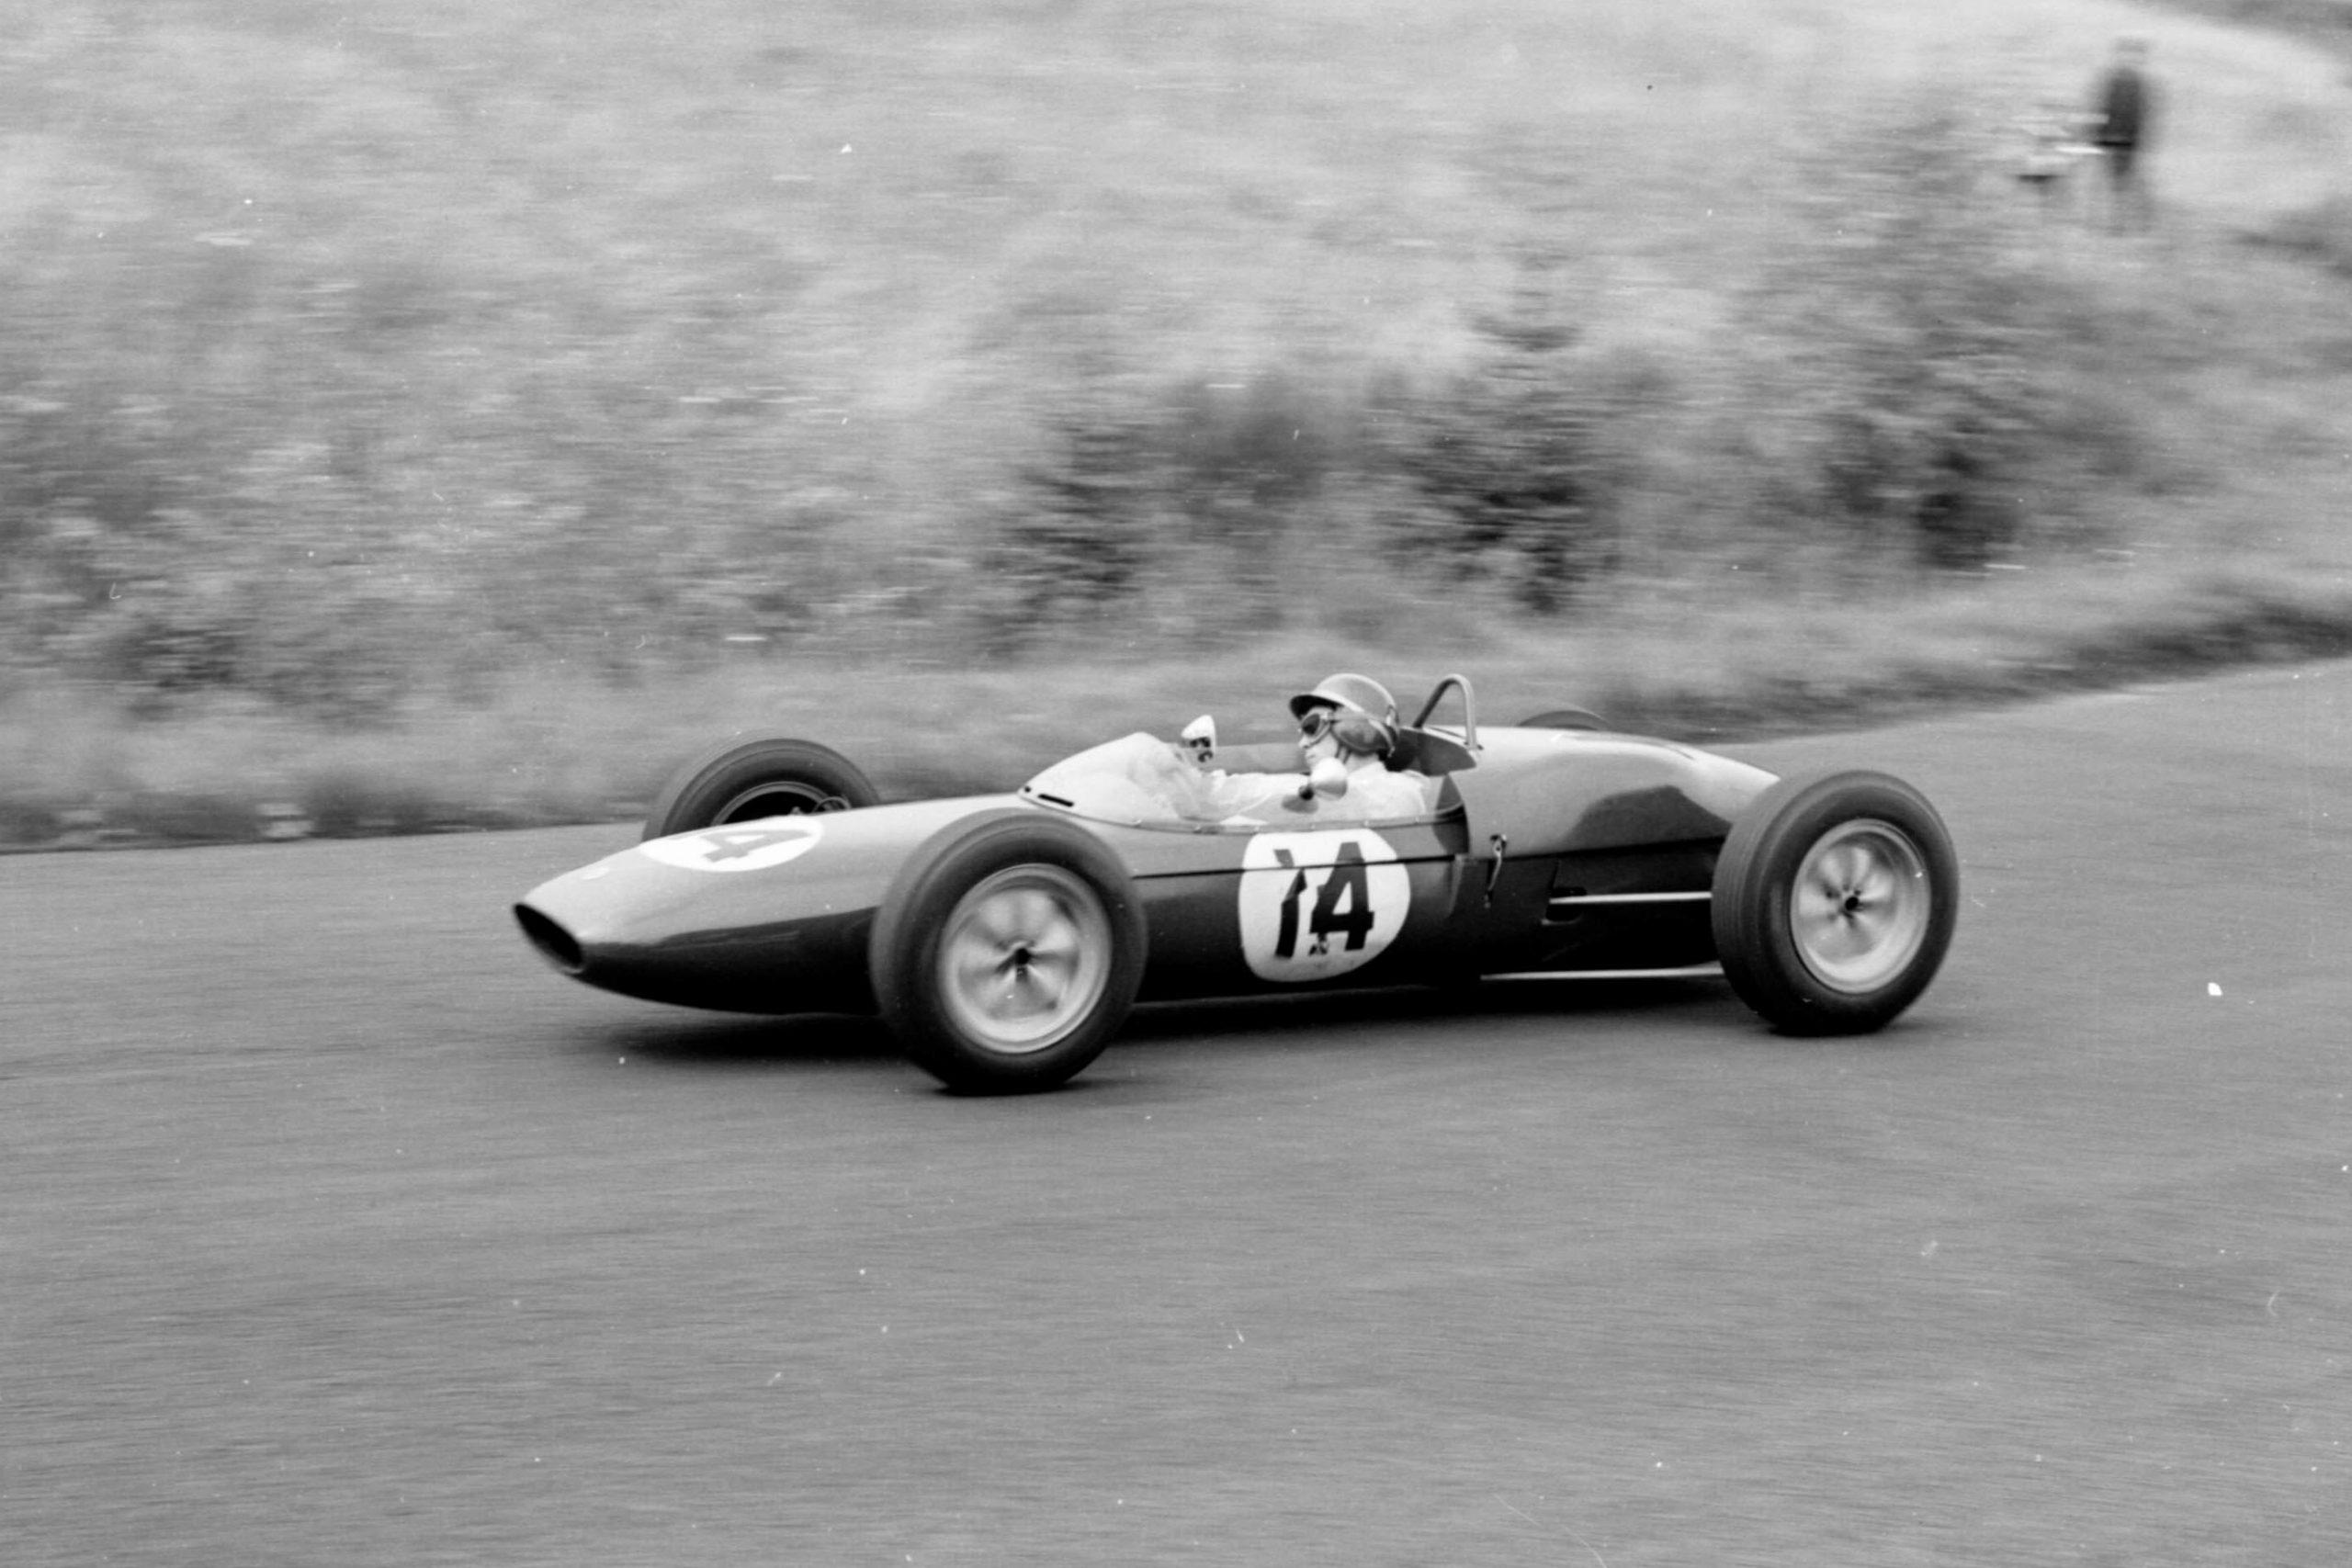 Jim Clark in his Lotus 21-Climax.